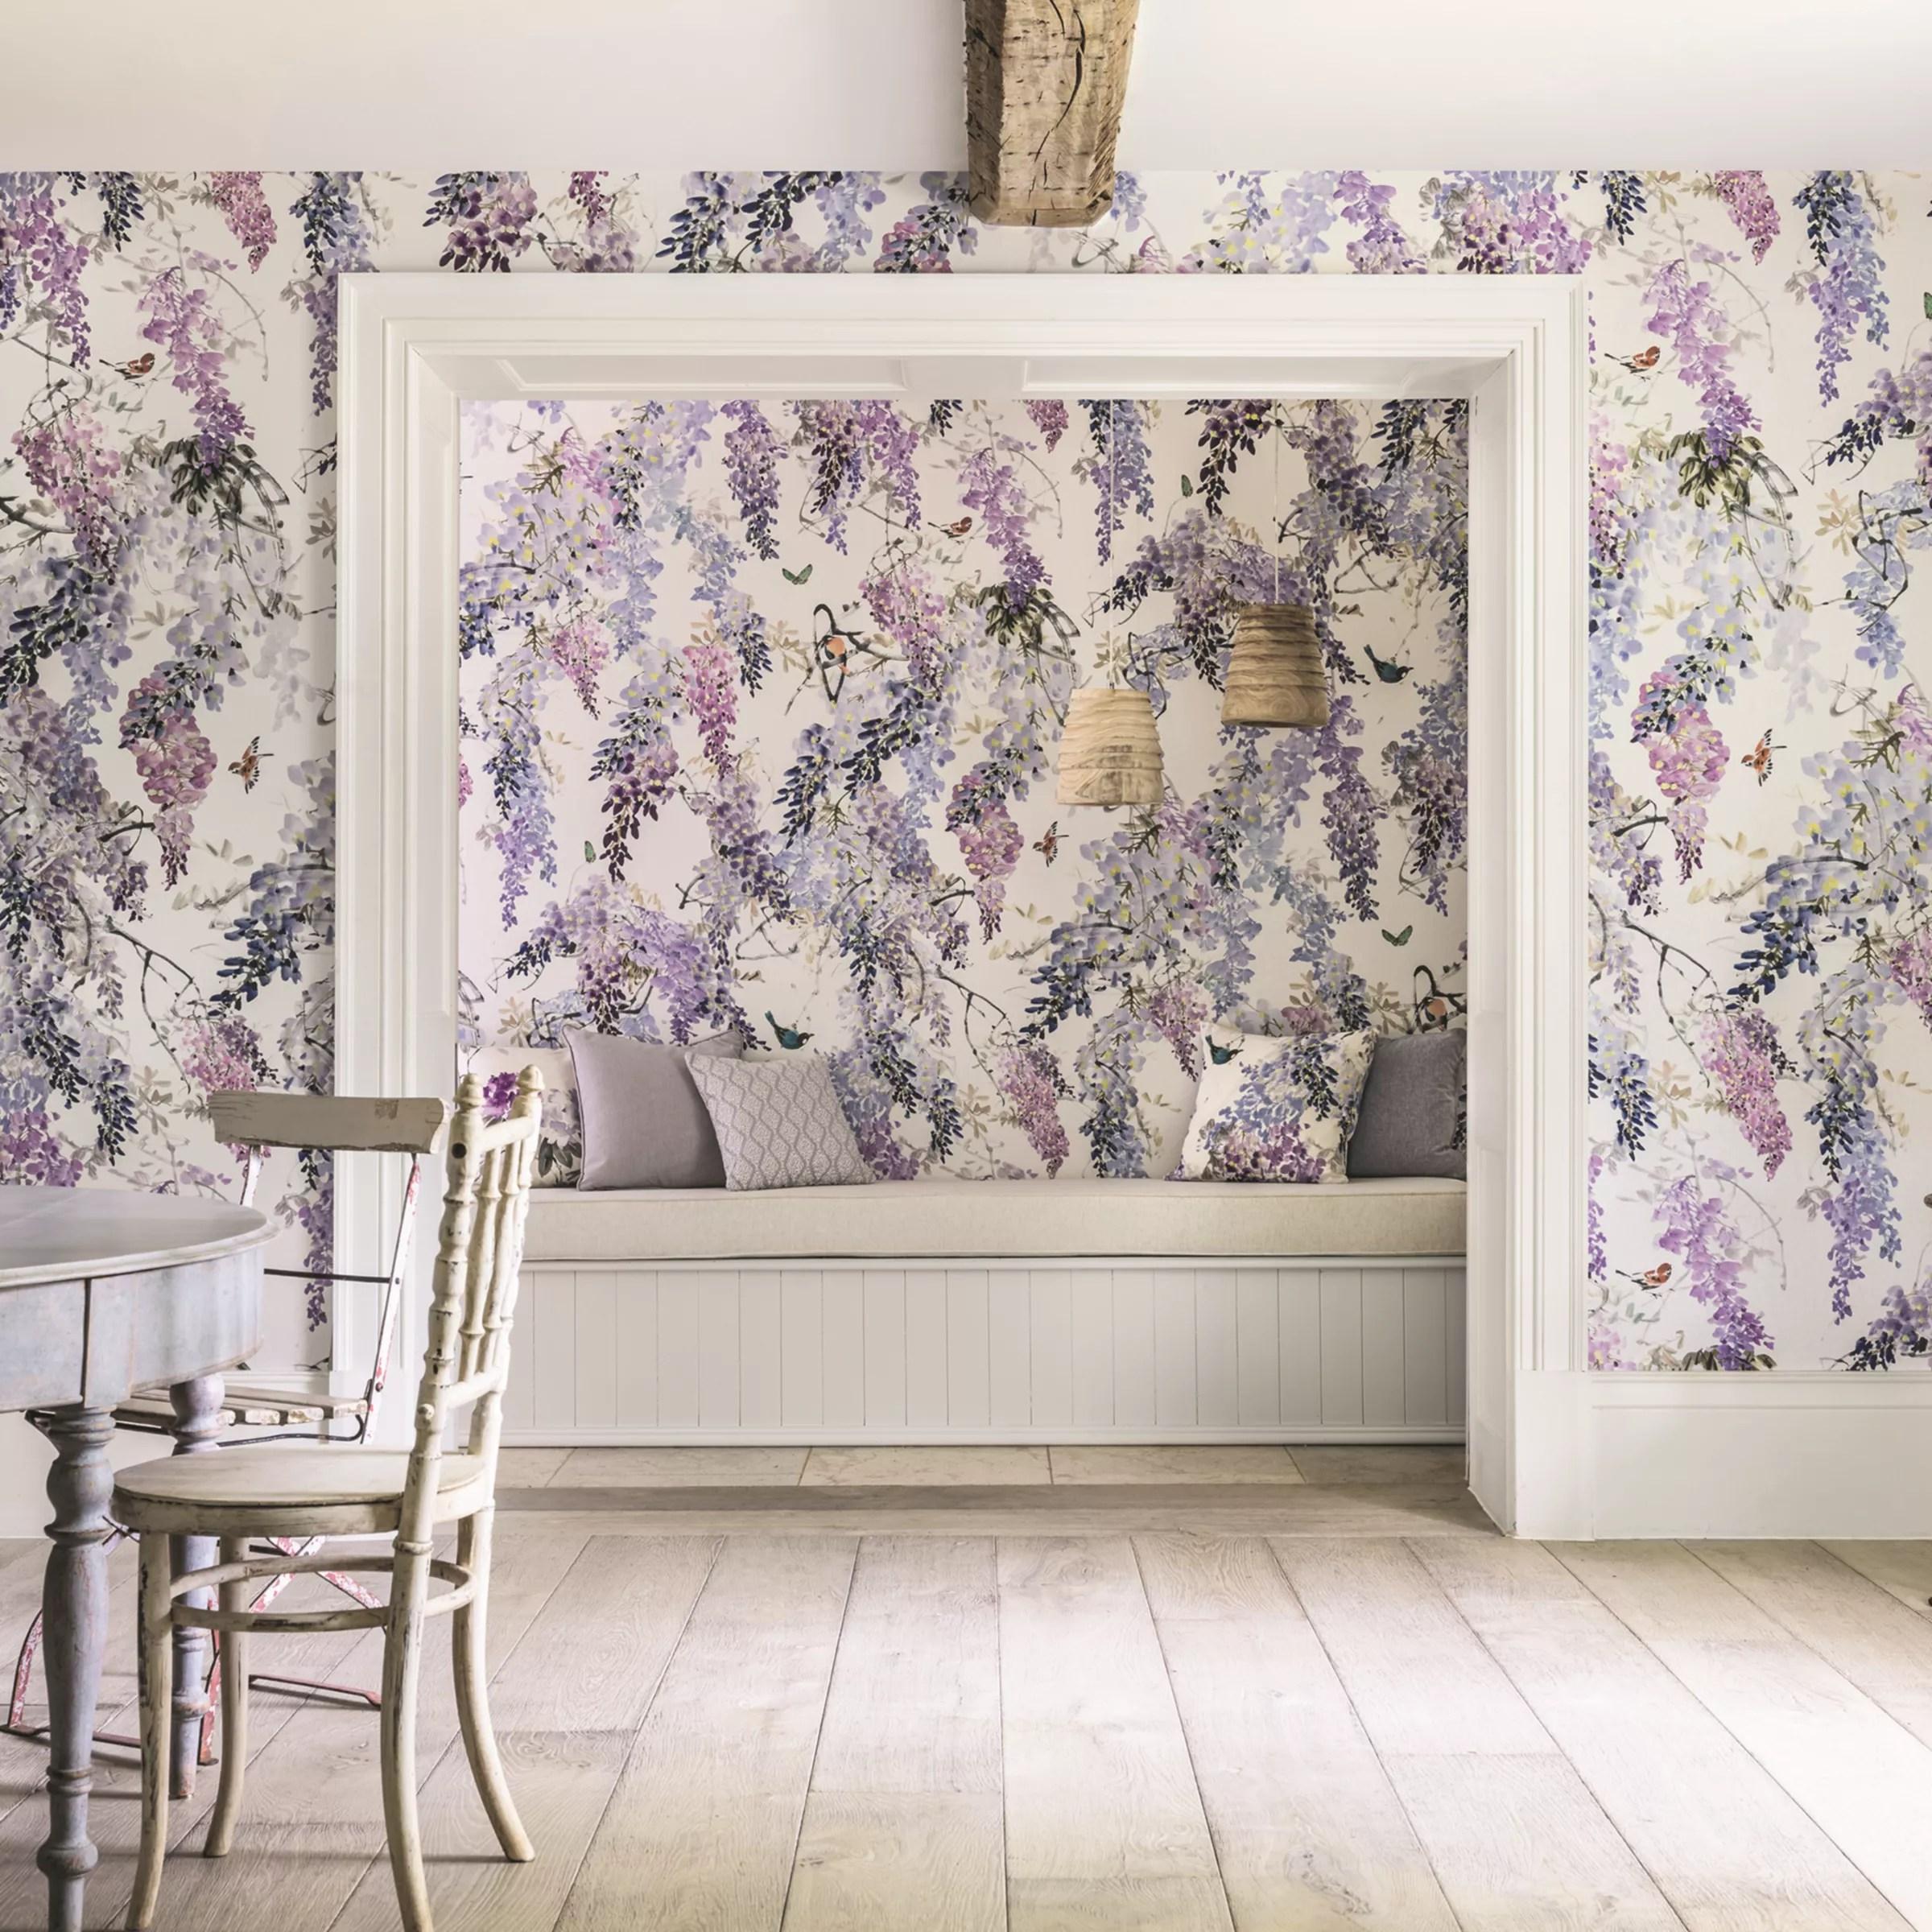 Sanderson Wisteria Falls Wallpaper Buy Sanderson Waterperry Wisteria Falls Wallpaper Lilac